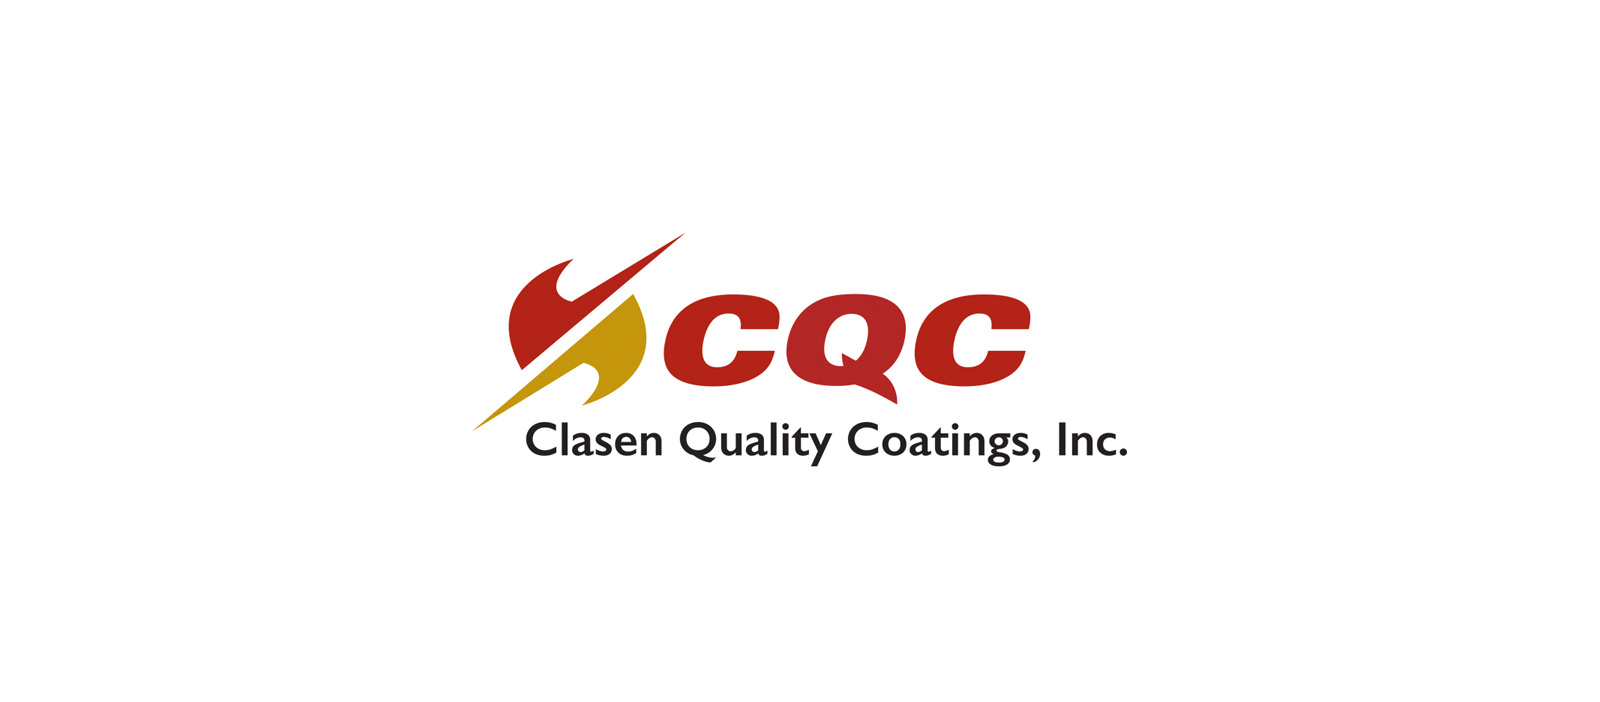 Clasen Quality Coatings, Inc. Logo